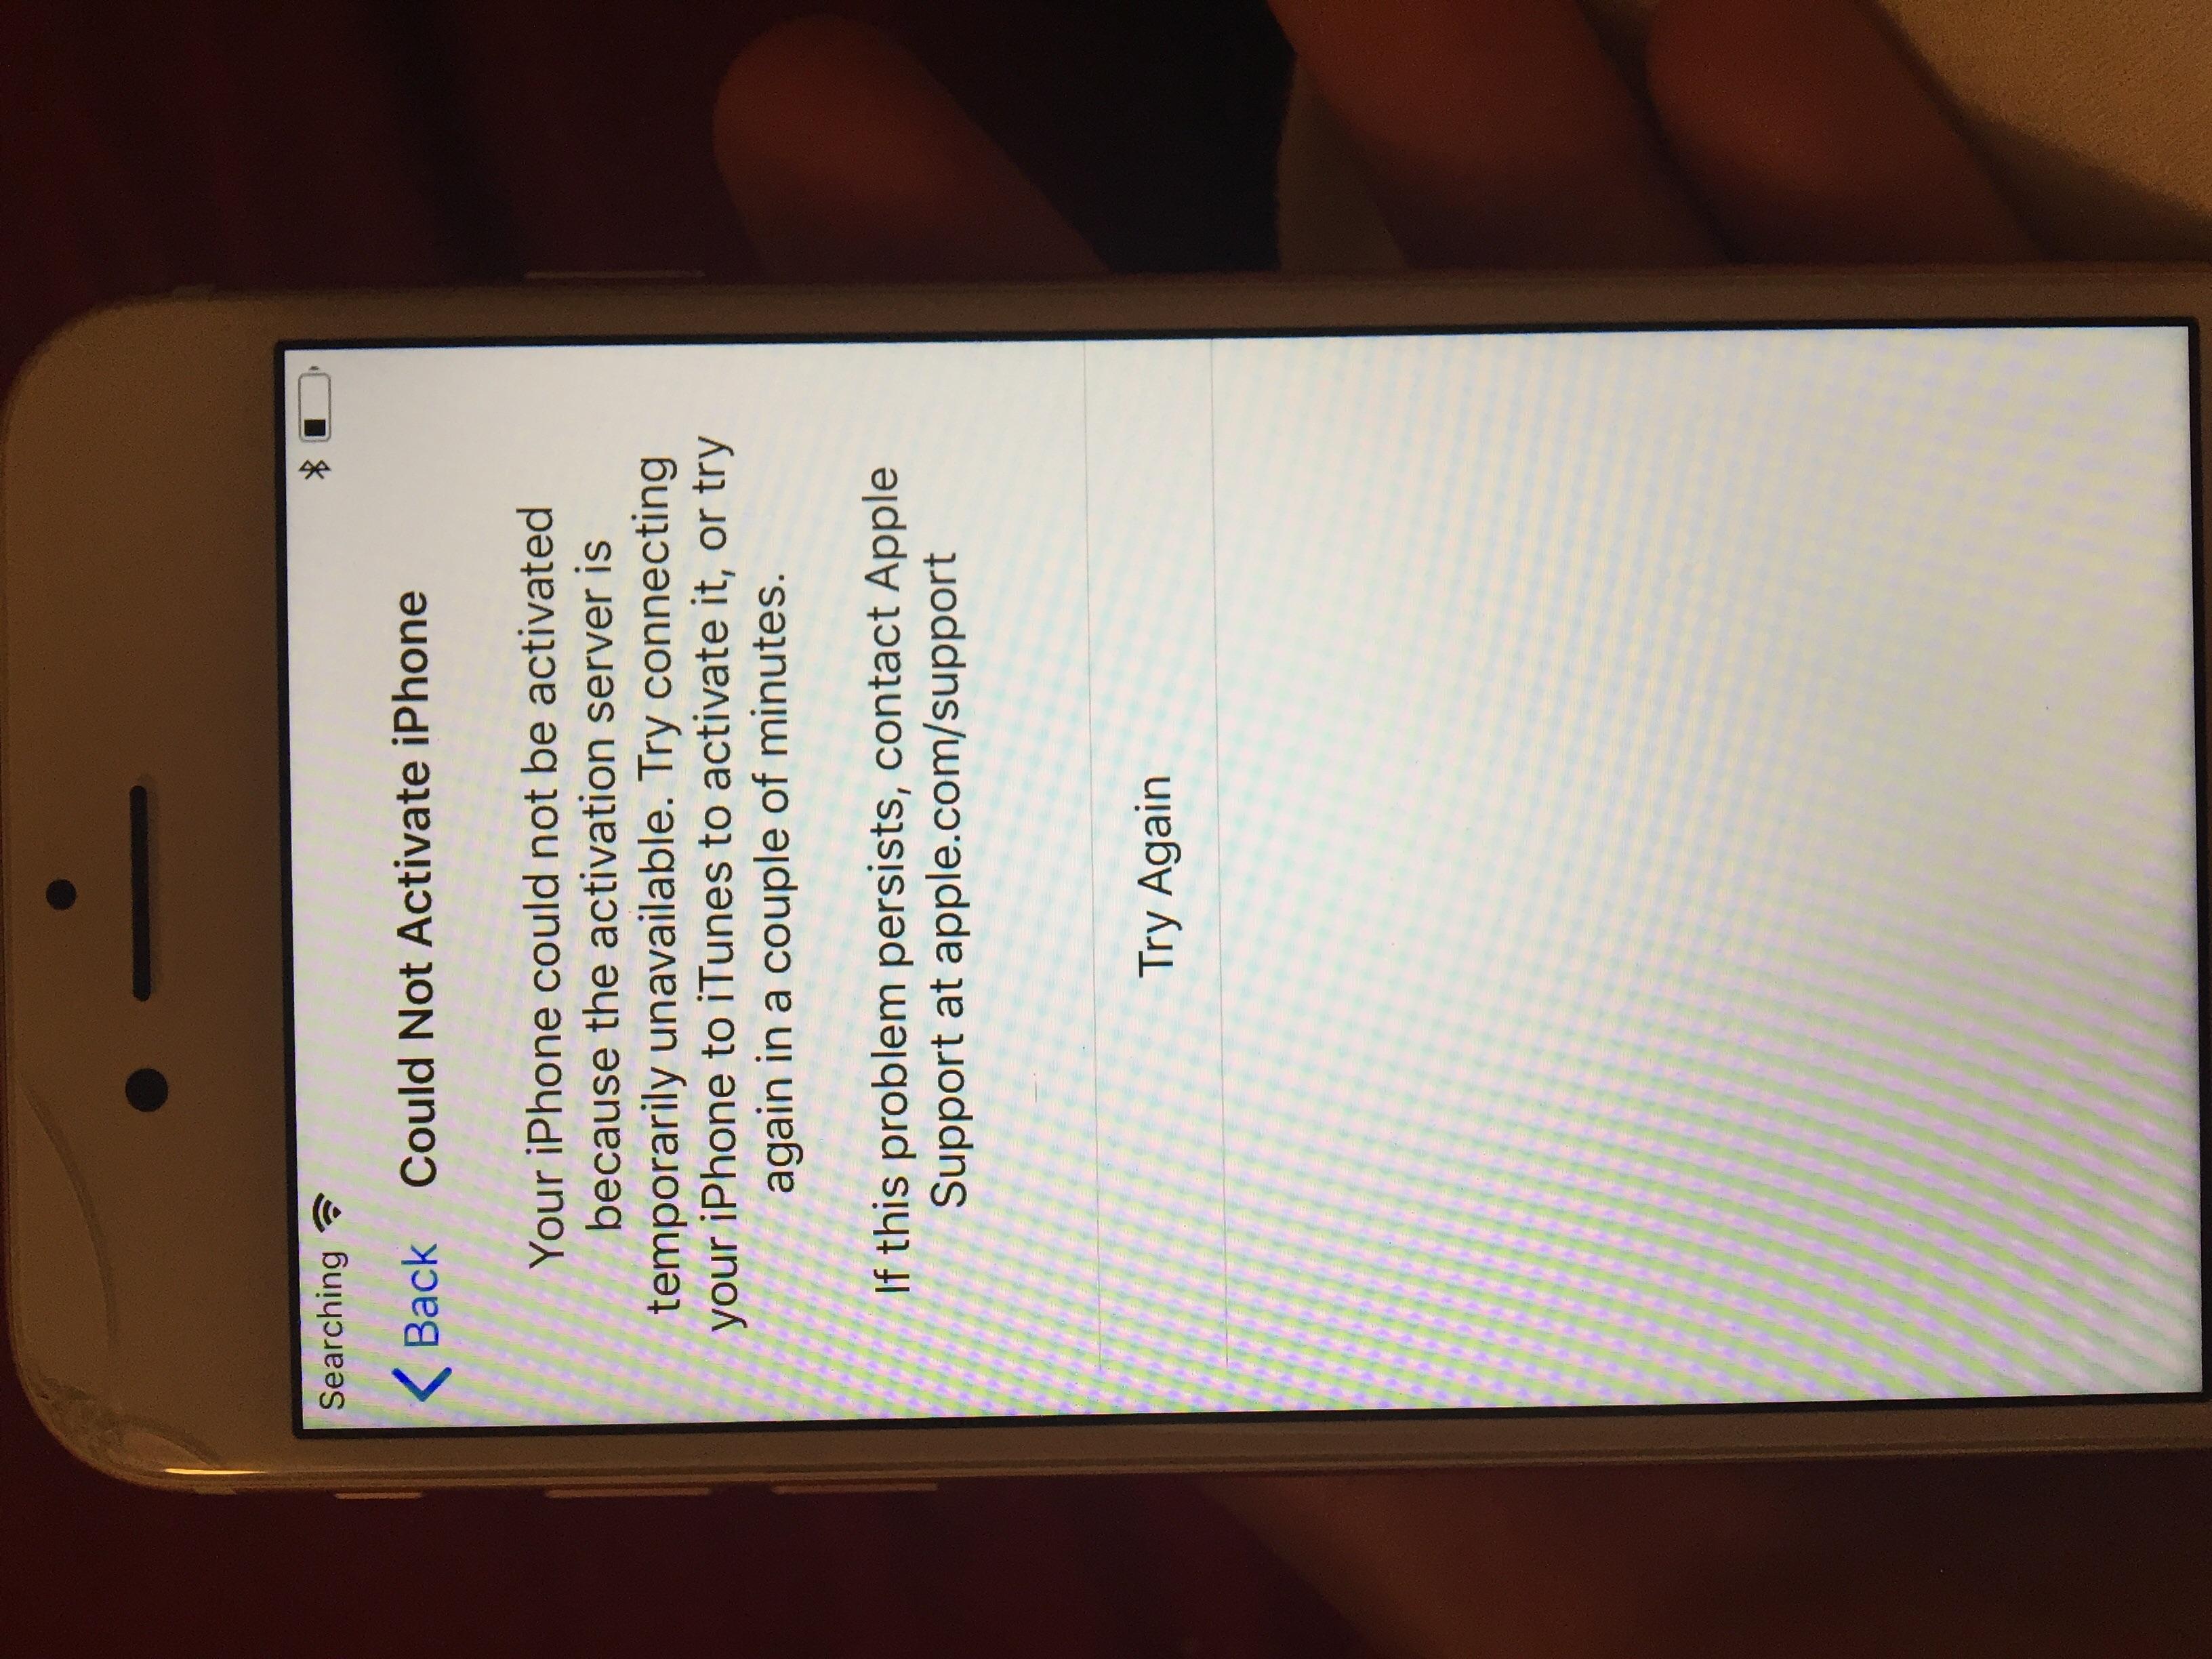 activation server iphone 7